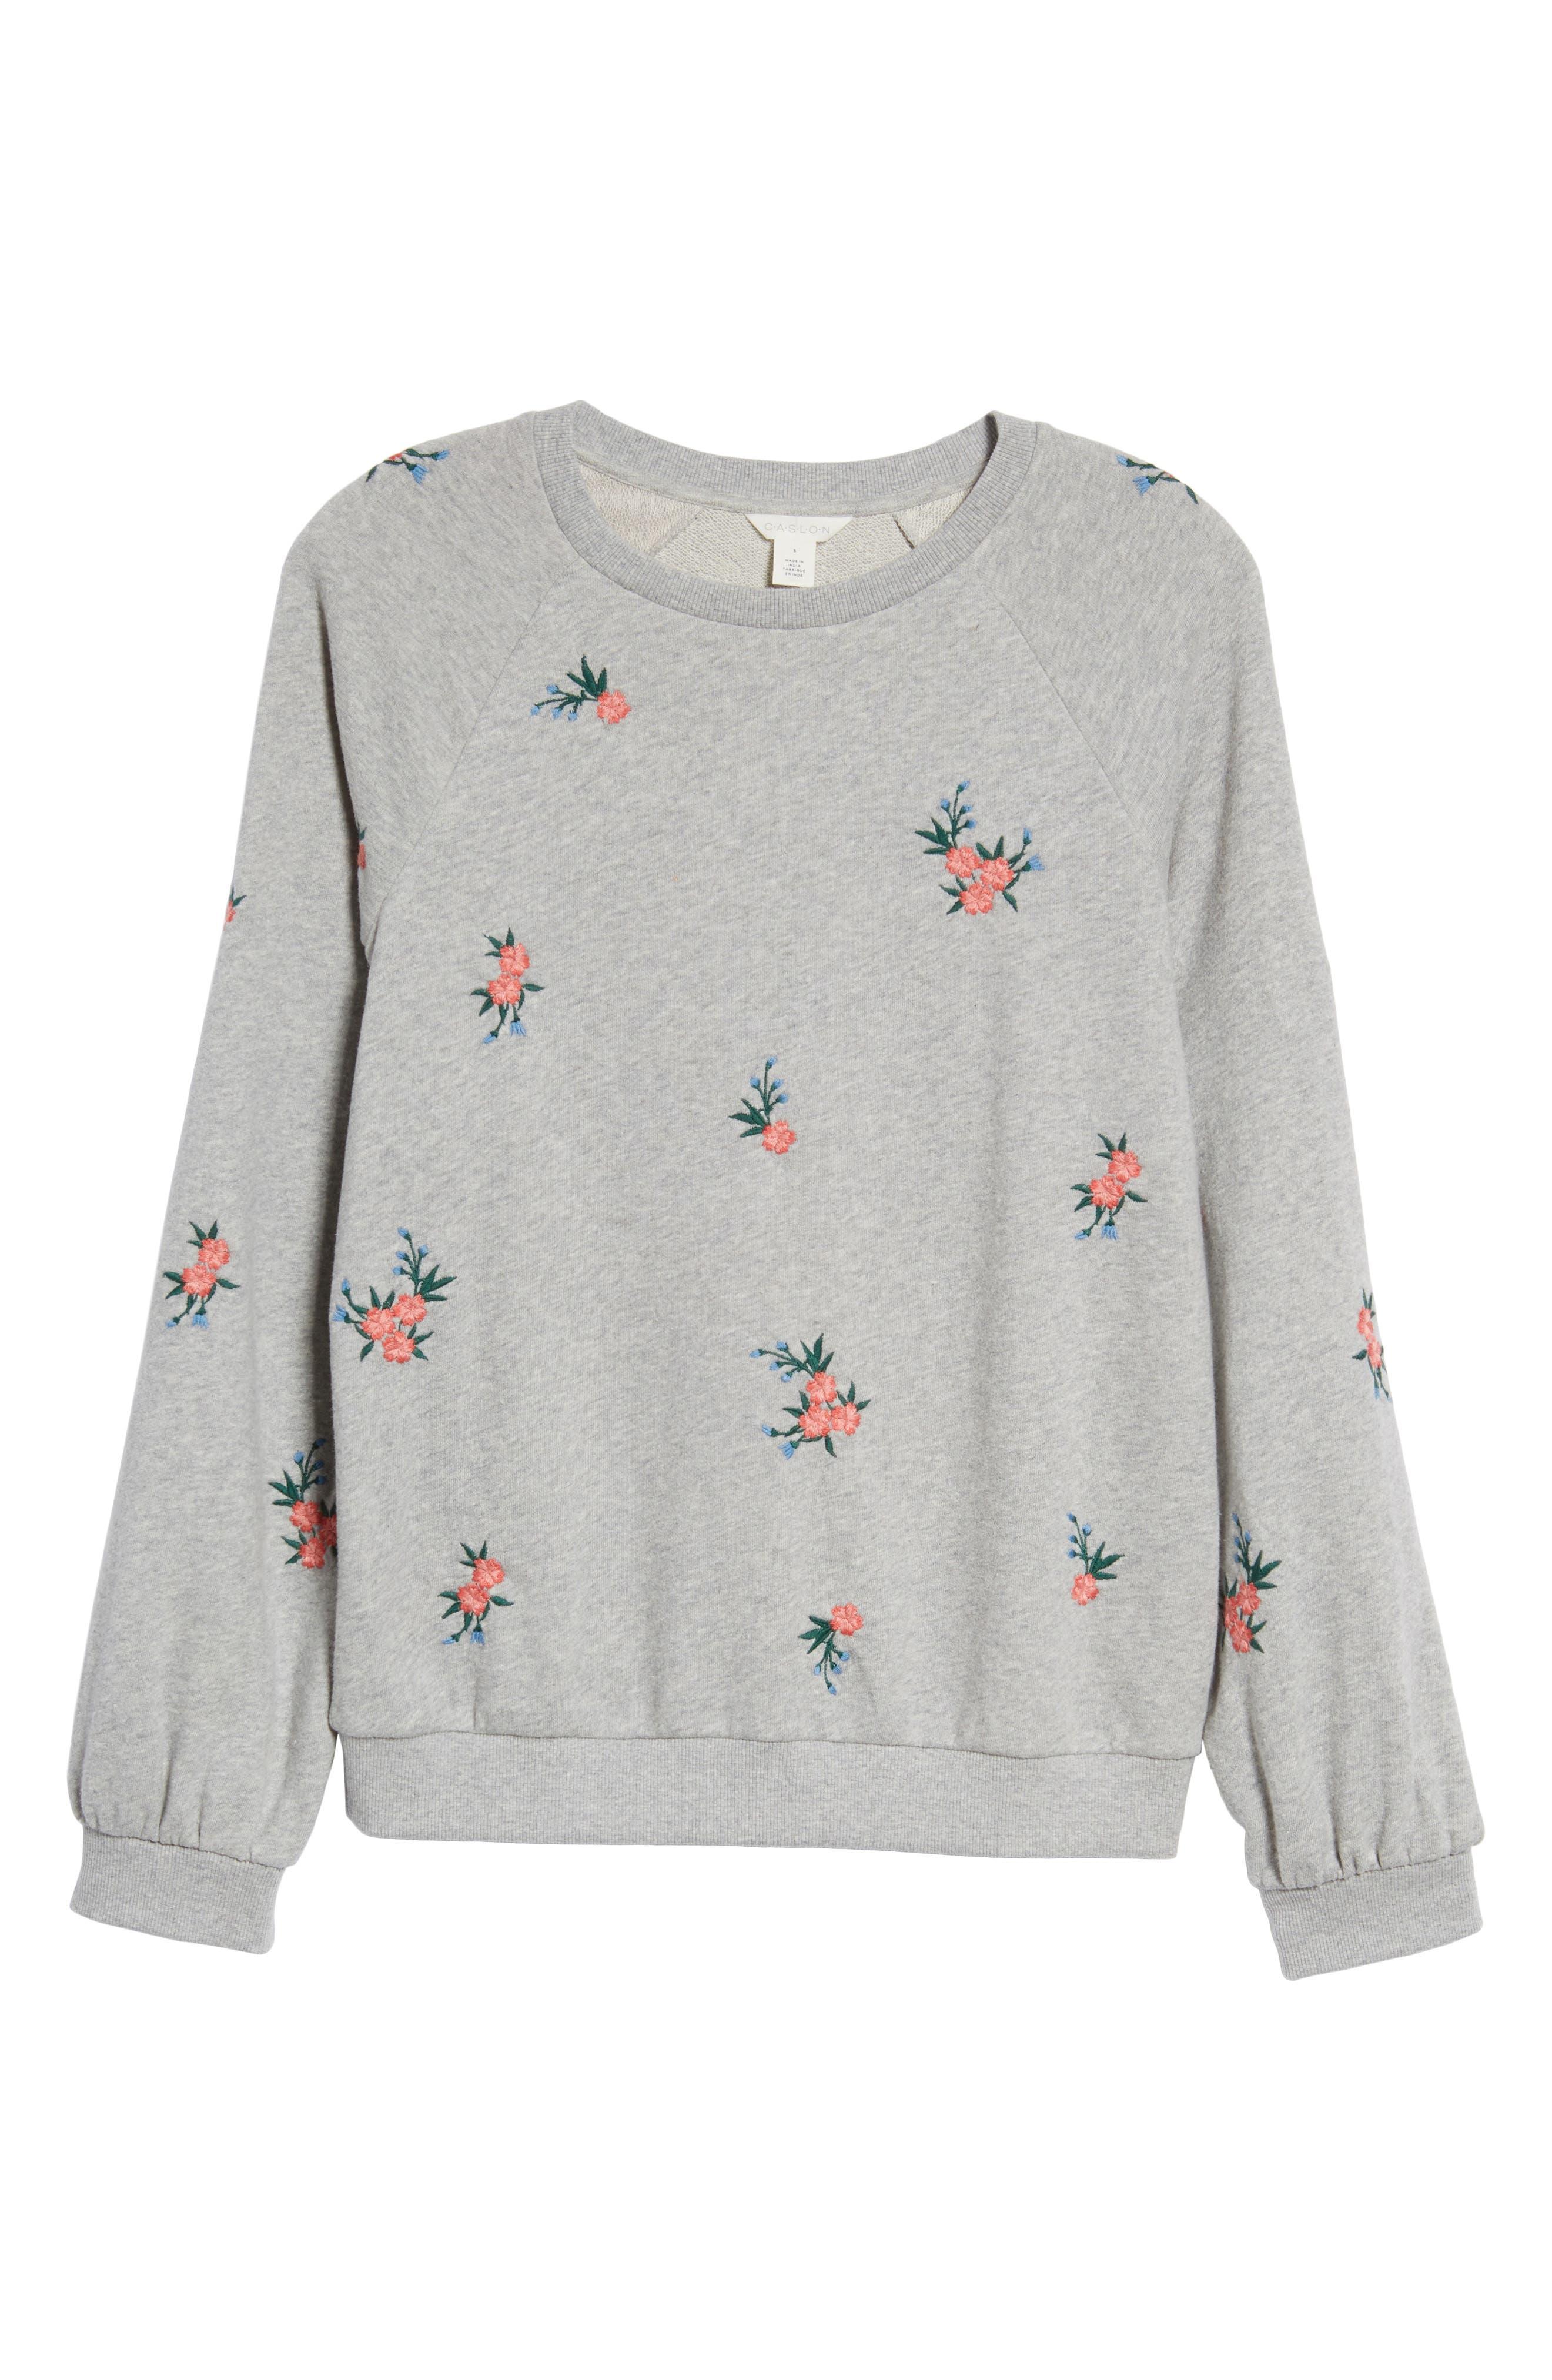 Embroidered Sweatshirt,                             Alternate thumbnail 6, color,                             030